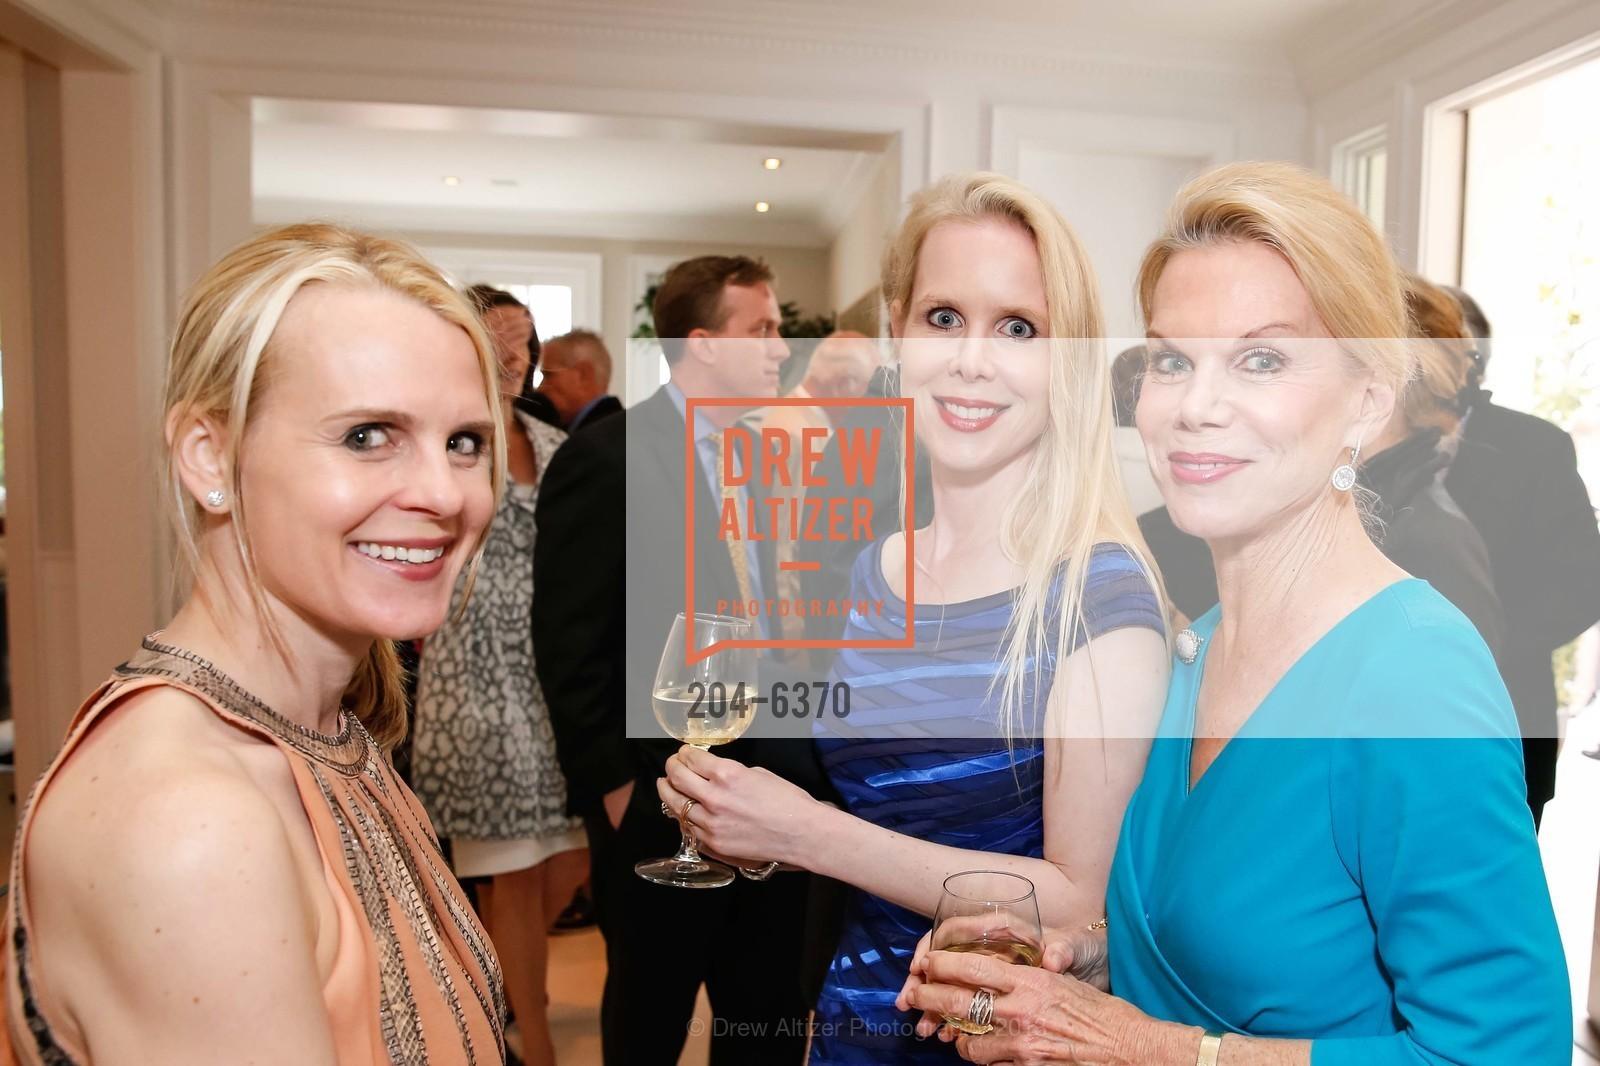 Jane Mudge, Shannon Cronan, Sandra Farris, Photo #204-6370